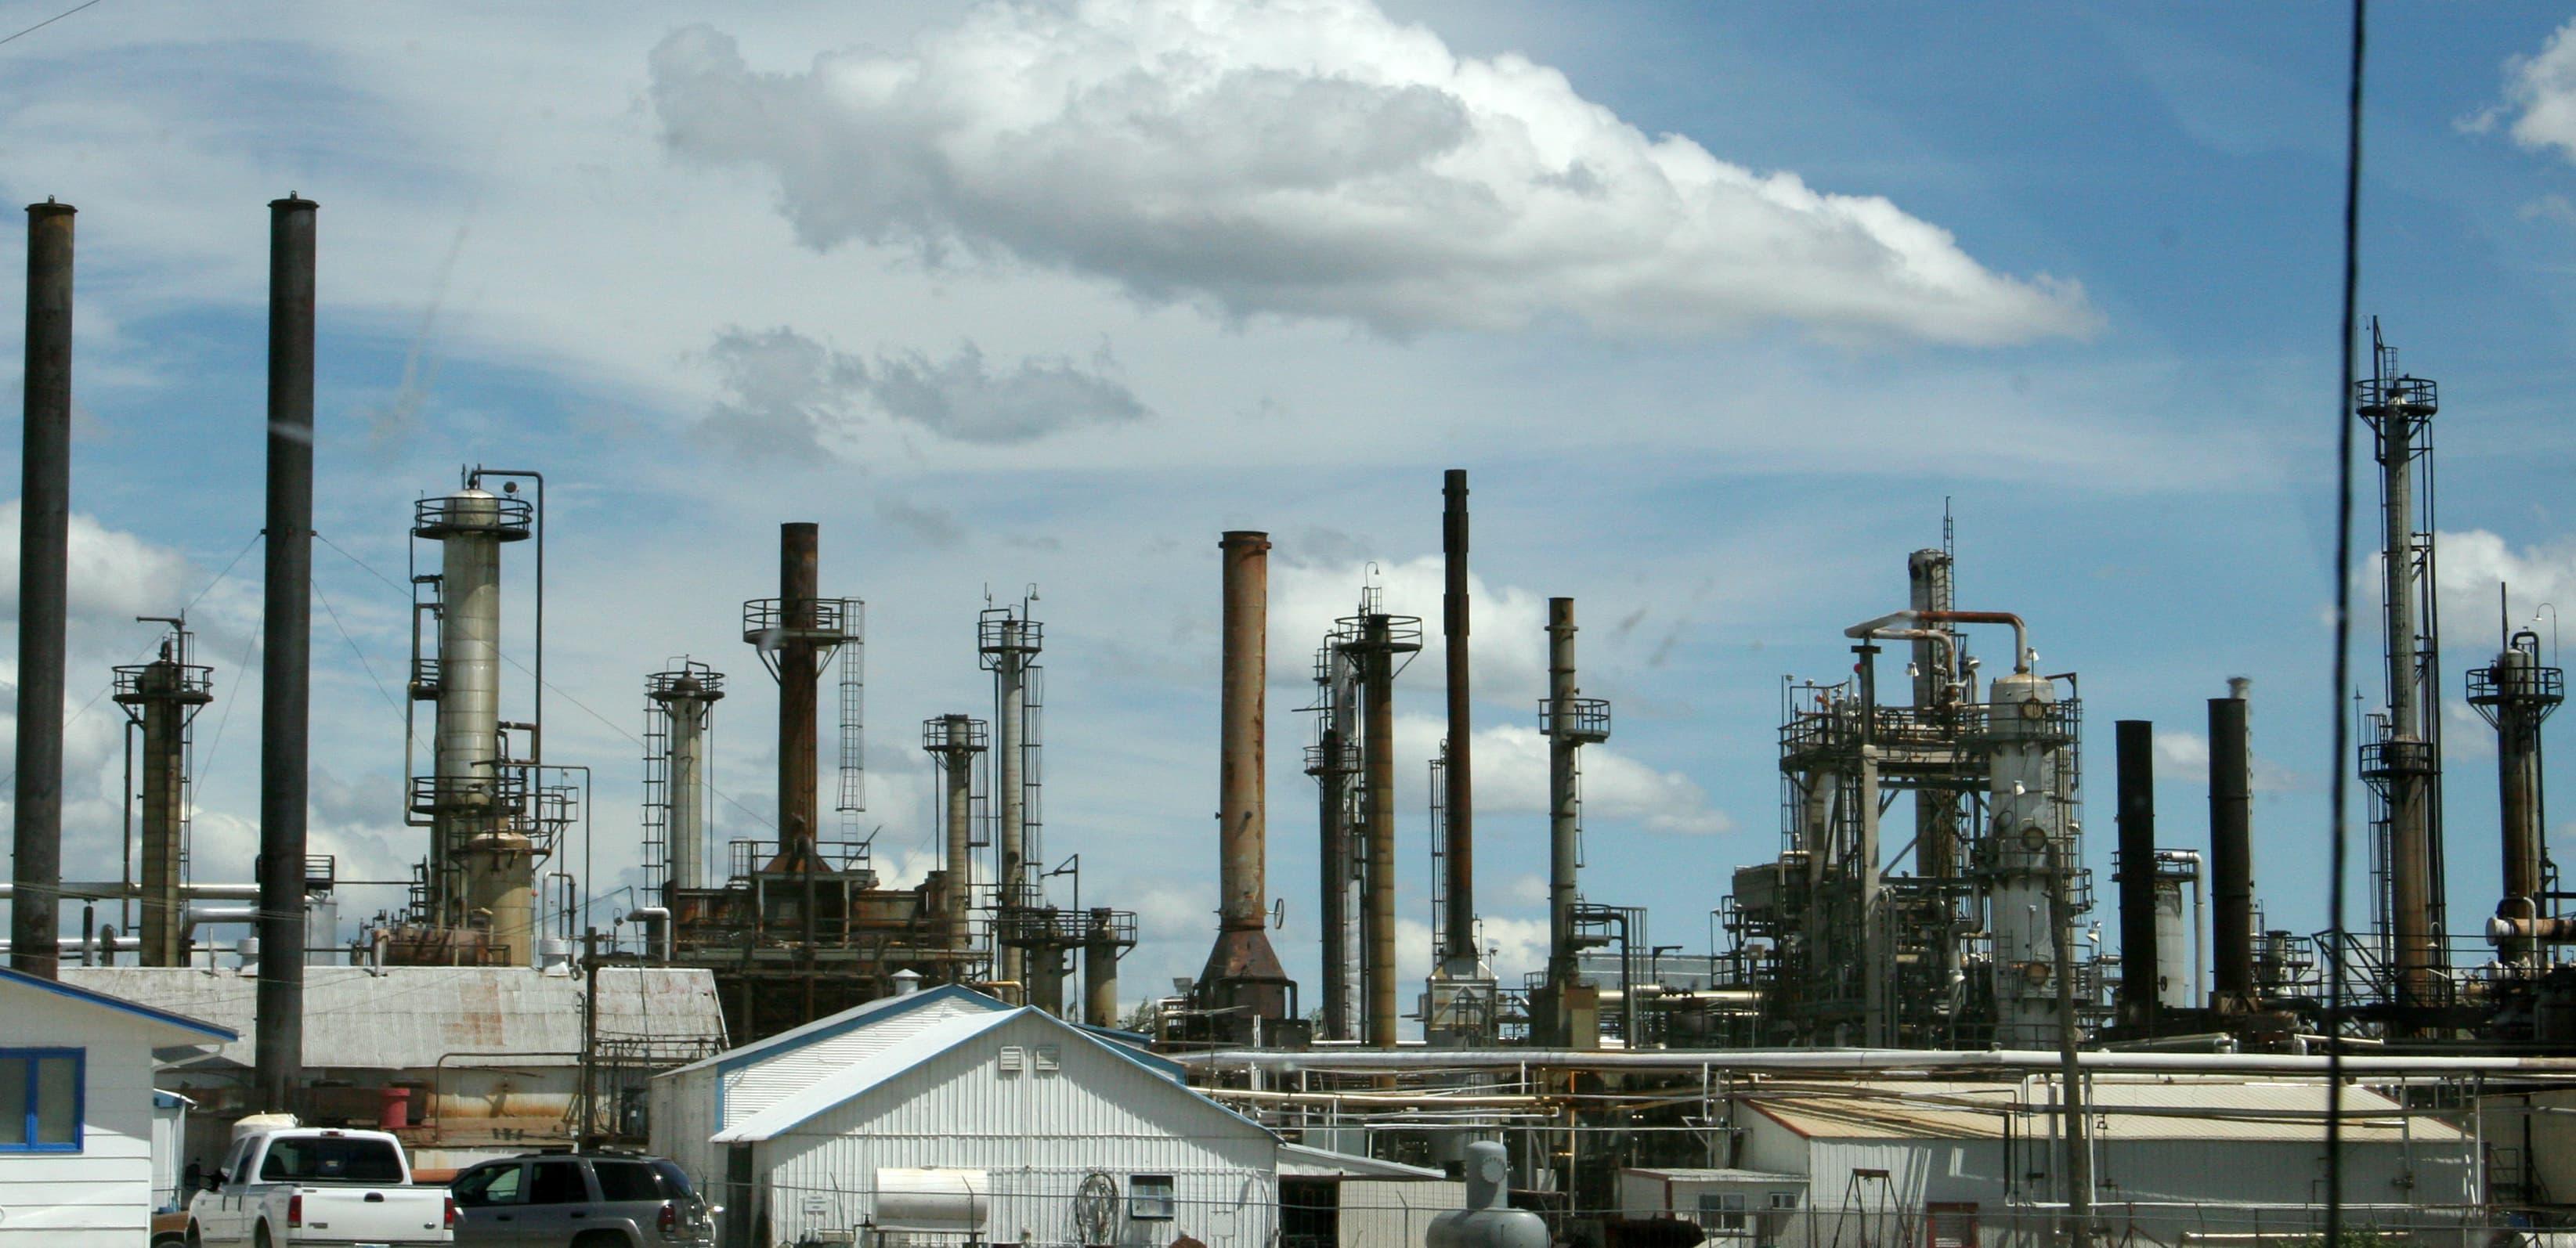 u0026 39 wild lands u0026 39  bullet dodged  oil still spills in wyoming